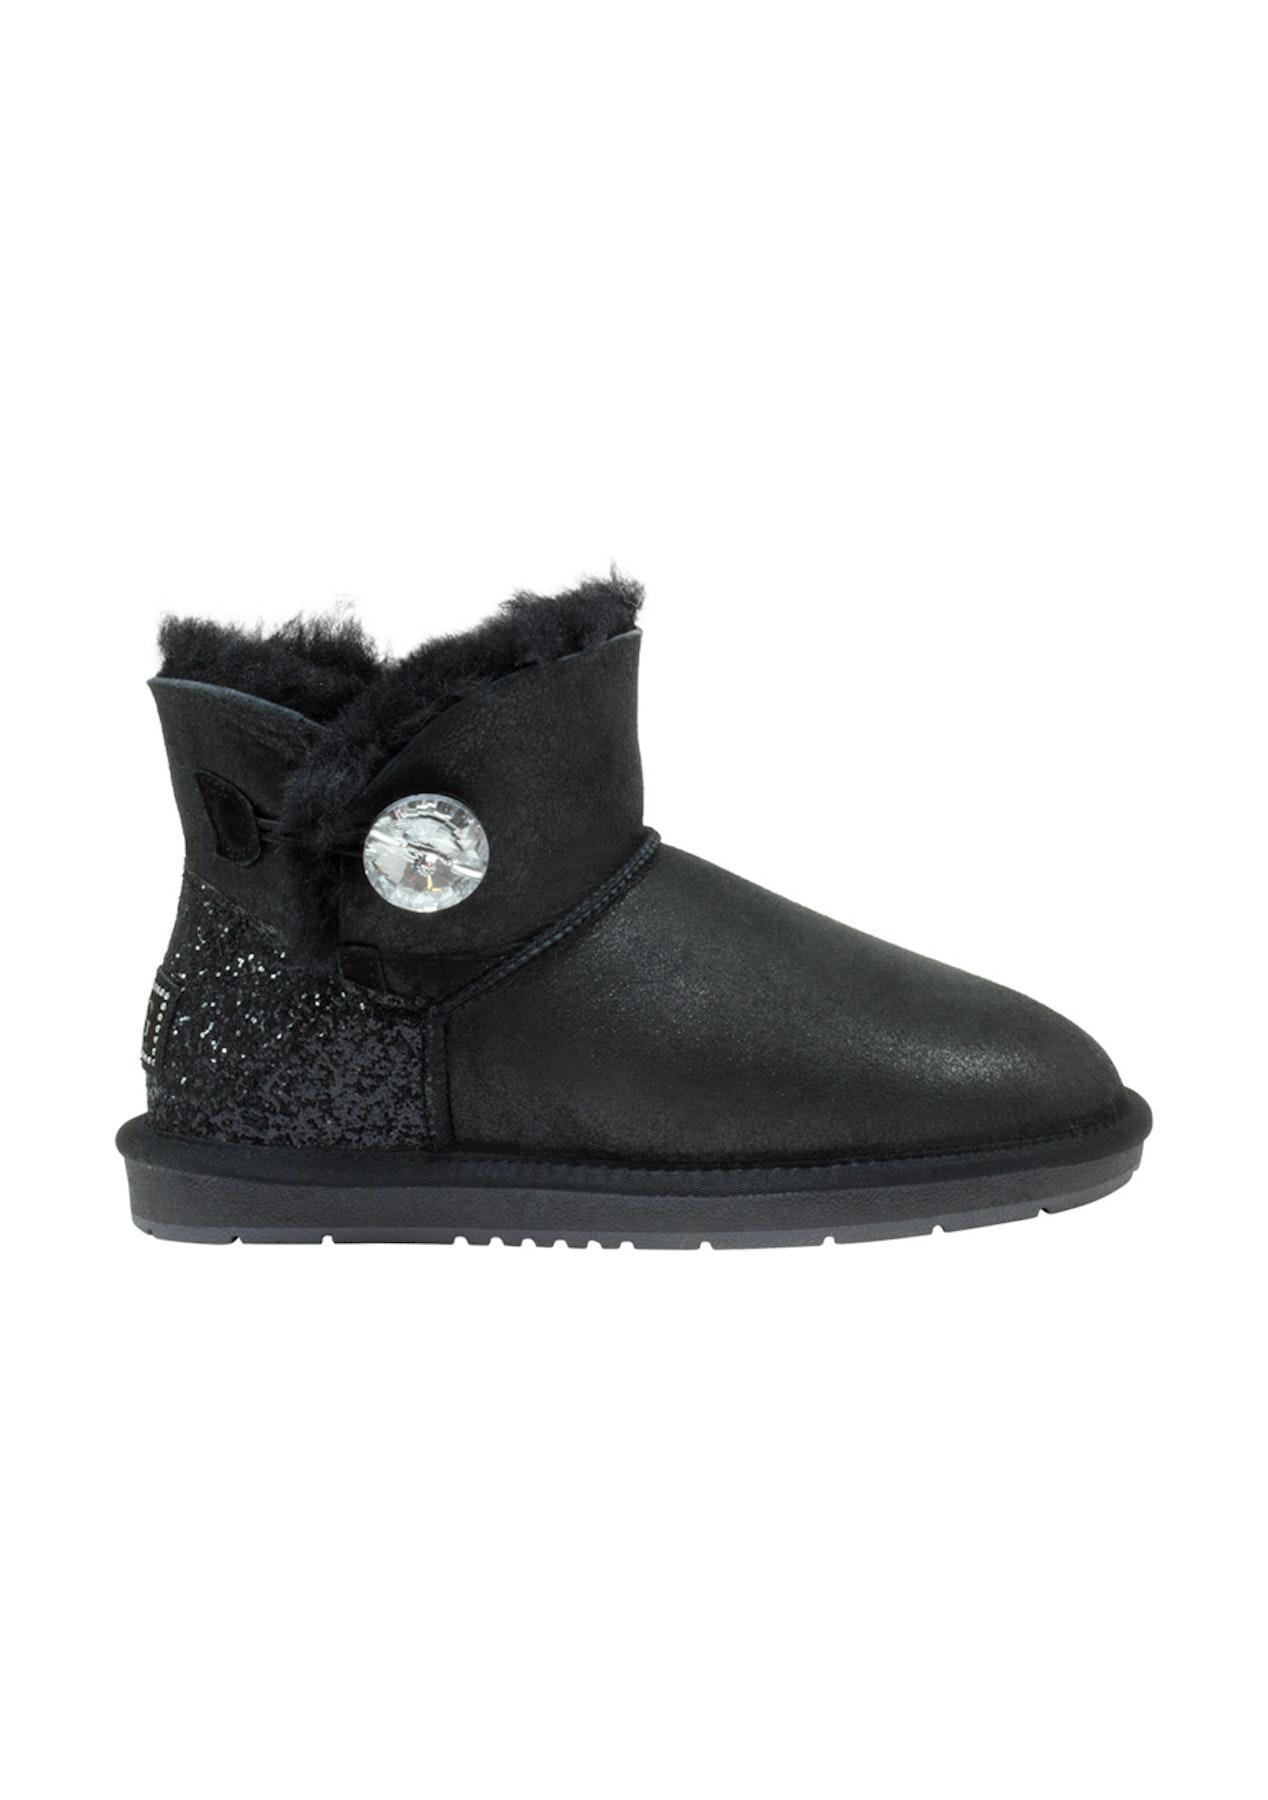 6eca6516bc6 Auzland Ugg Boots Women's Nappa Mini Crystal Button Water Resistant  Australian Sheepskin Black